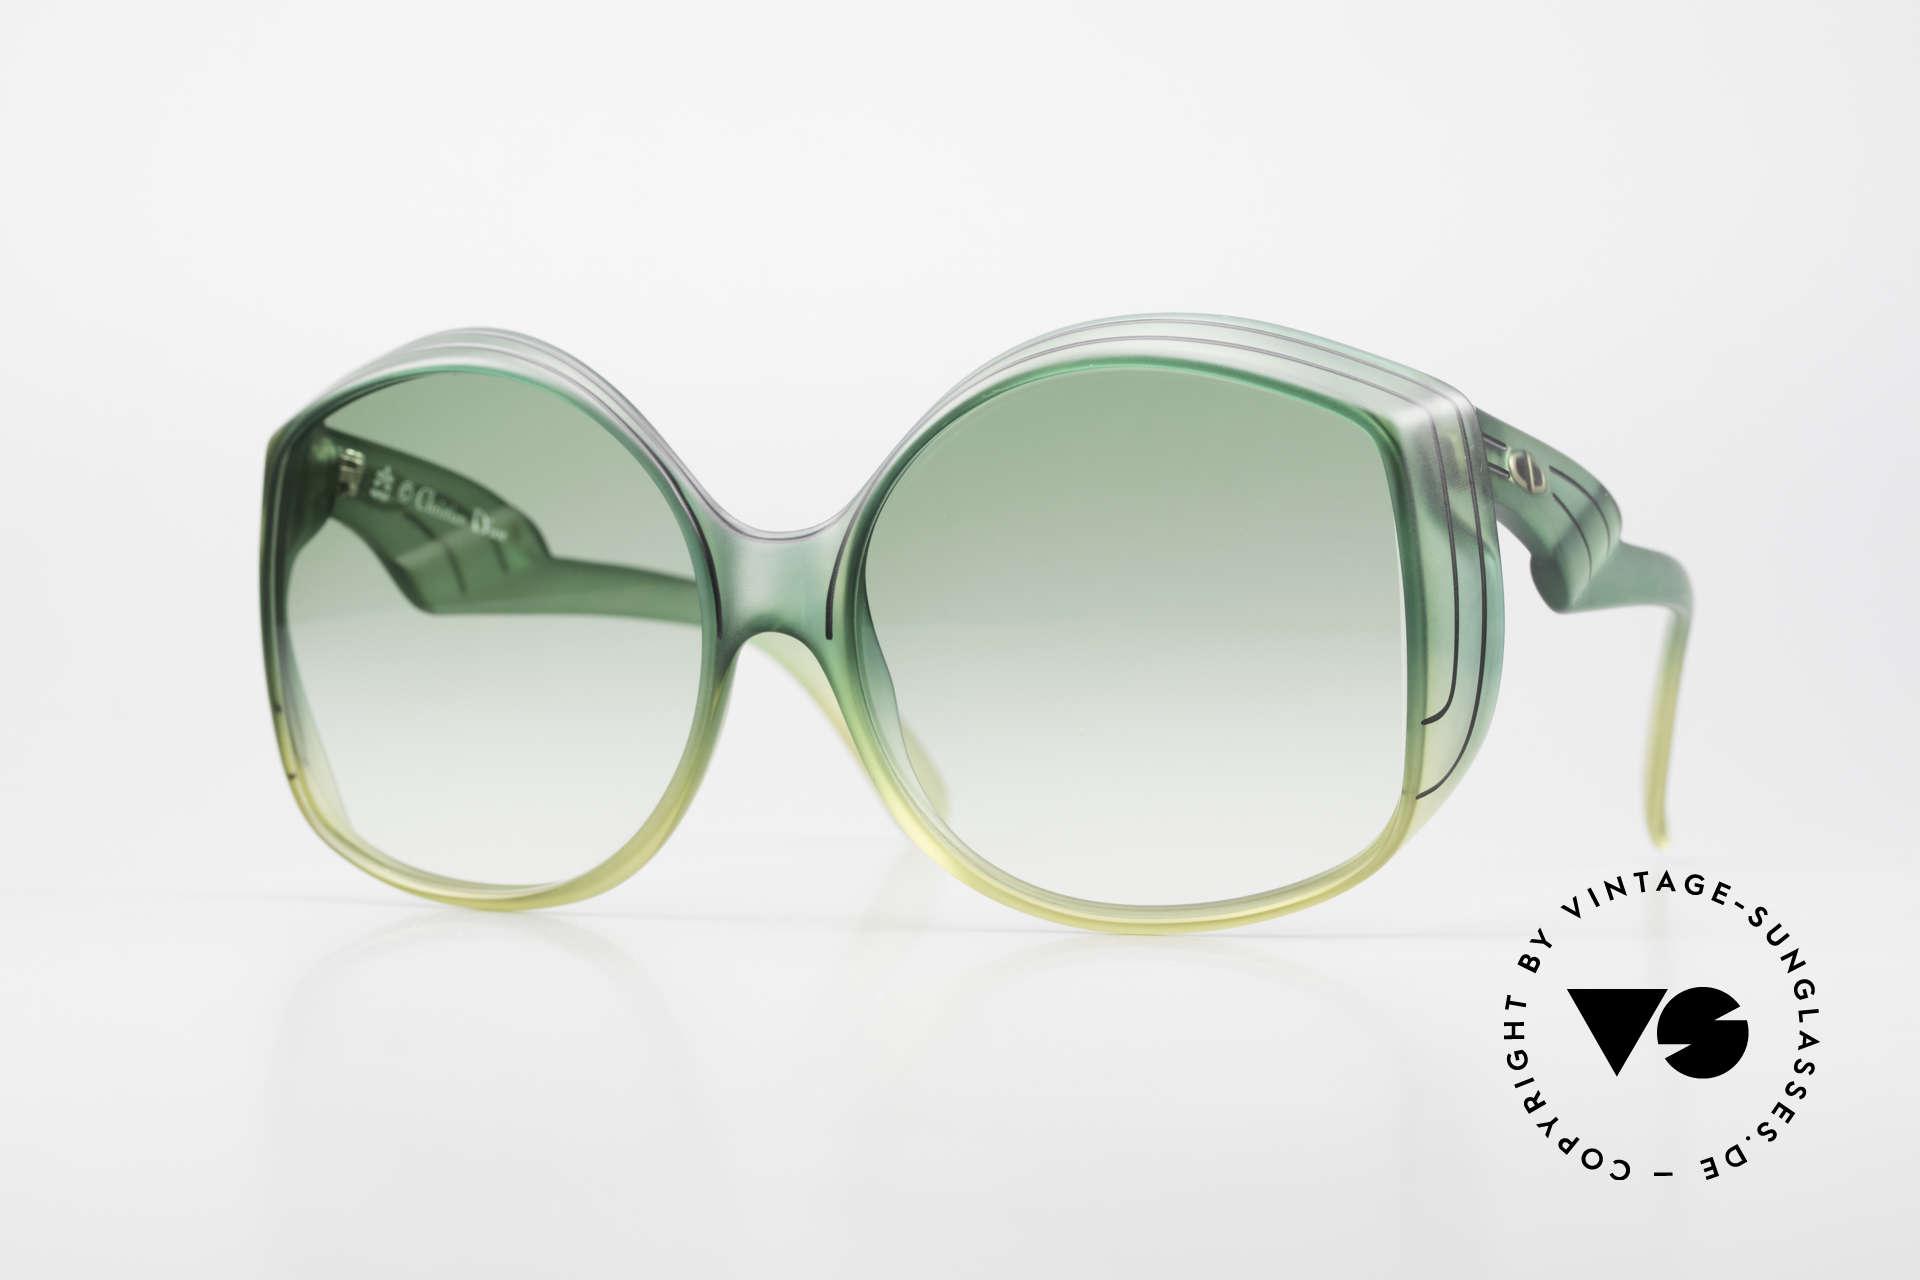 Christian Dior 2041 XXL 1970's Ladies Sunglasses, magical Christian Dior designer sunglasses of the 70's, Made for Women